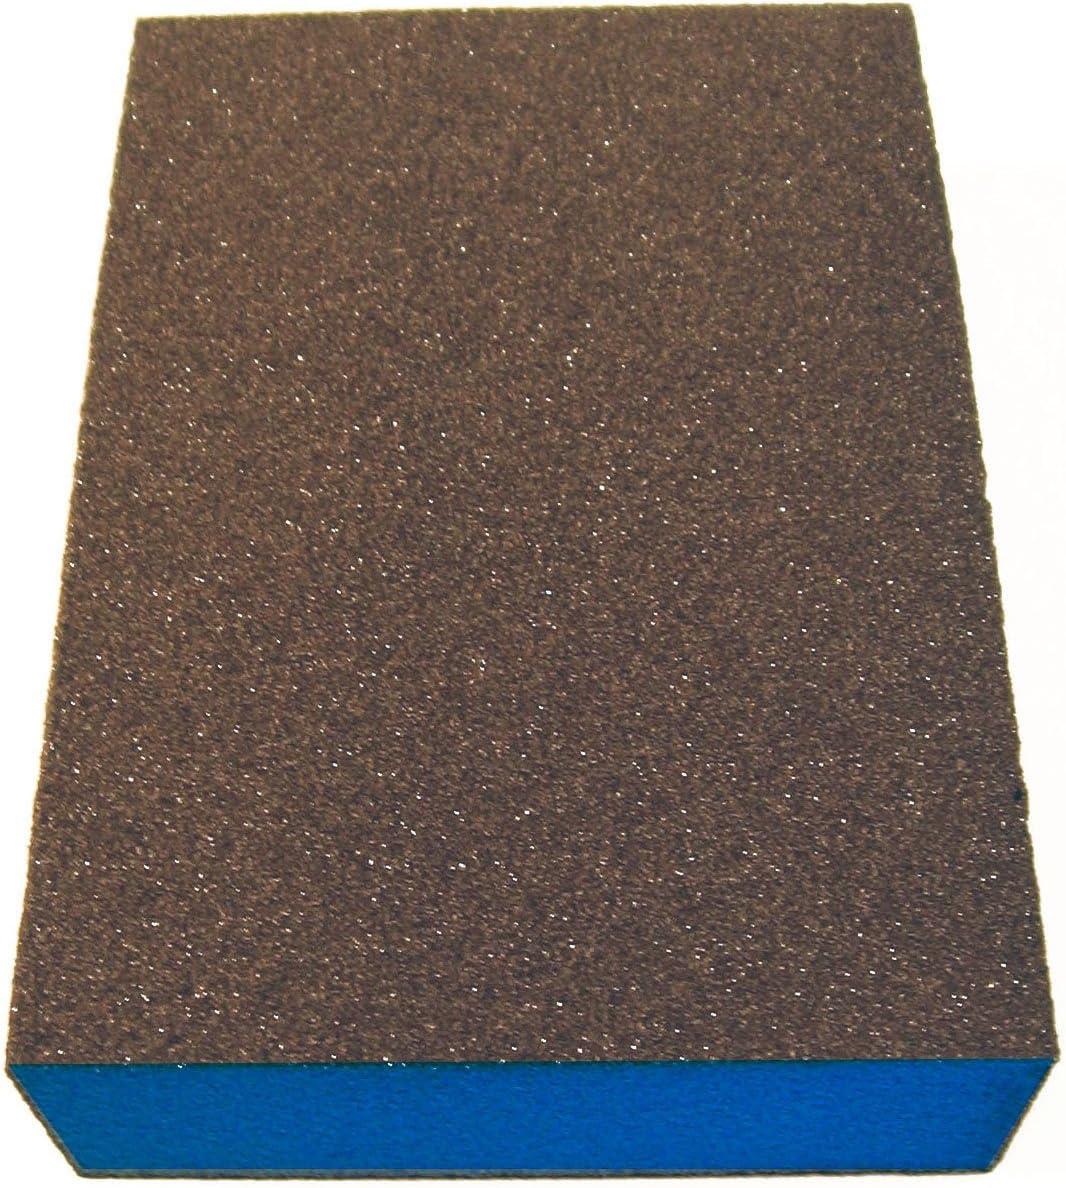 24-Pack 24-Pack Webb Abrasives 601007 Z-Foam Block Sanding Sponges Medium//Fine Grit 2 5//8 x 3 7//8 x 1 2 5//8 x 3 7//8 x 1 Phoenix Tapes of Charlotte NC